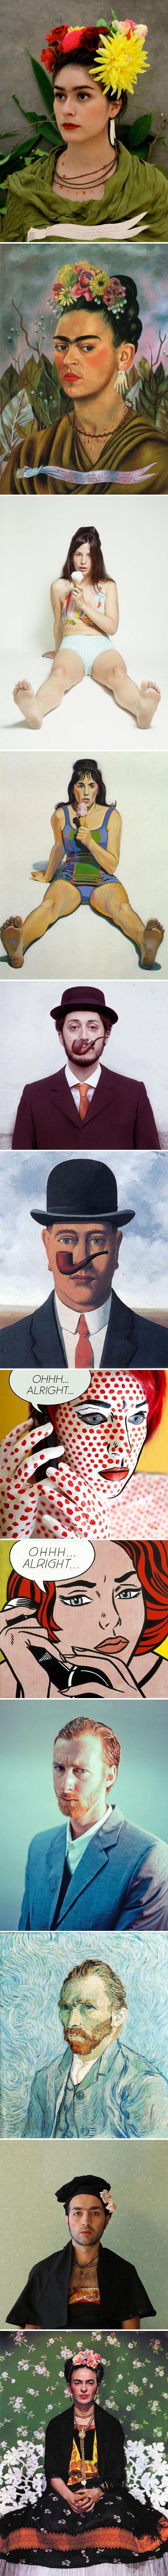 "Remake {1.""Self portrait dedicated to Dr. Eloesser"" remake by Yesenia Caloca, original by Frida Kahlo   2. ""Girl with Ice Cream Cone"" remake by Stephanie Gonot, original by Wayne Thiebaud  3. ""La bonne foi"" remake by Noemi Mazzucchelli, original by Magritte  4. ""Ohhh…Alright…"" remake by Emily Kiel, original by Roy Lichtenstein  5. ""Self Portrait 1889″ remake by Seth Johnson, original by Vincent van Gogh  6. ""Portrait of Frida Kahlo"" remake by Danilo Ursini, original by Frida Kahlo}"